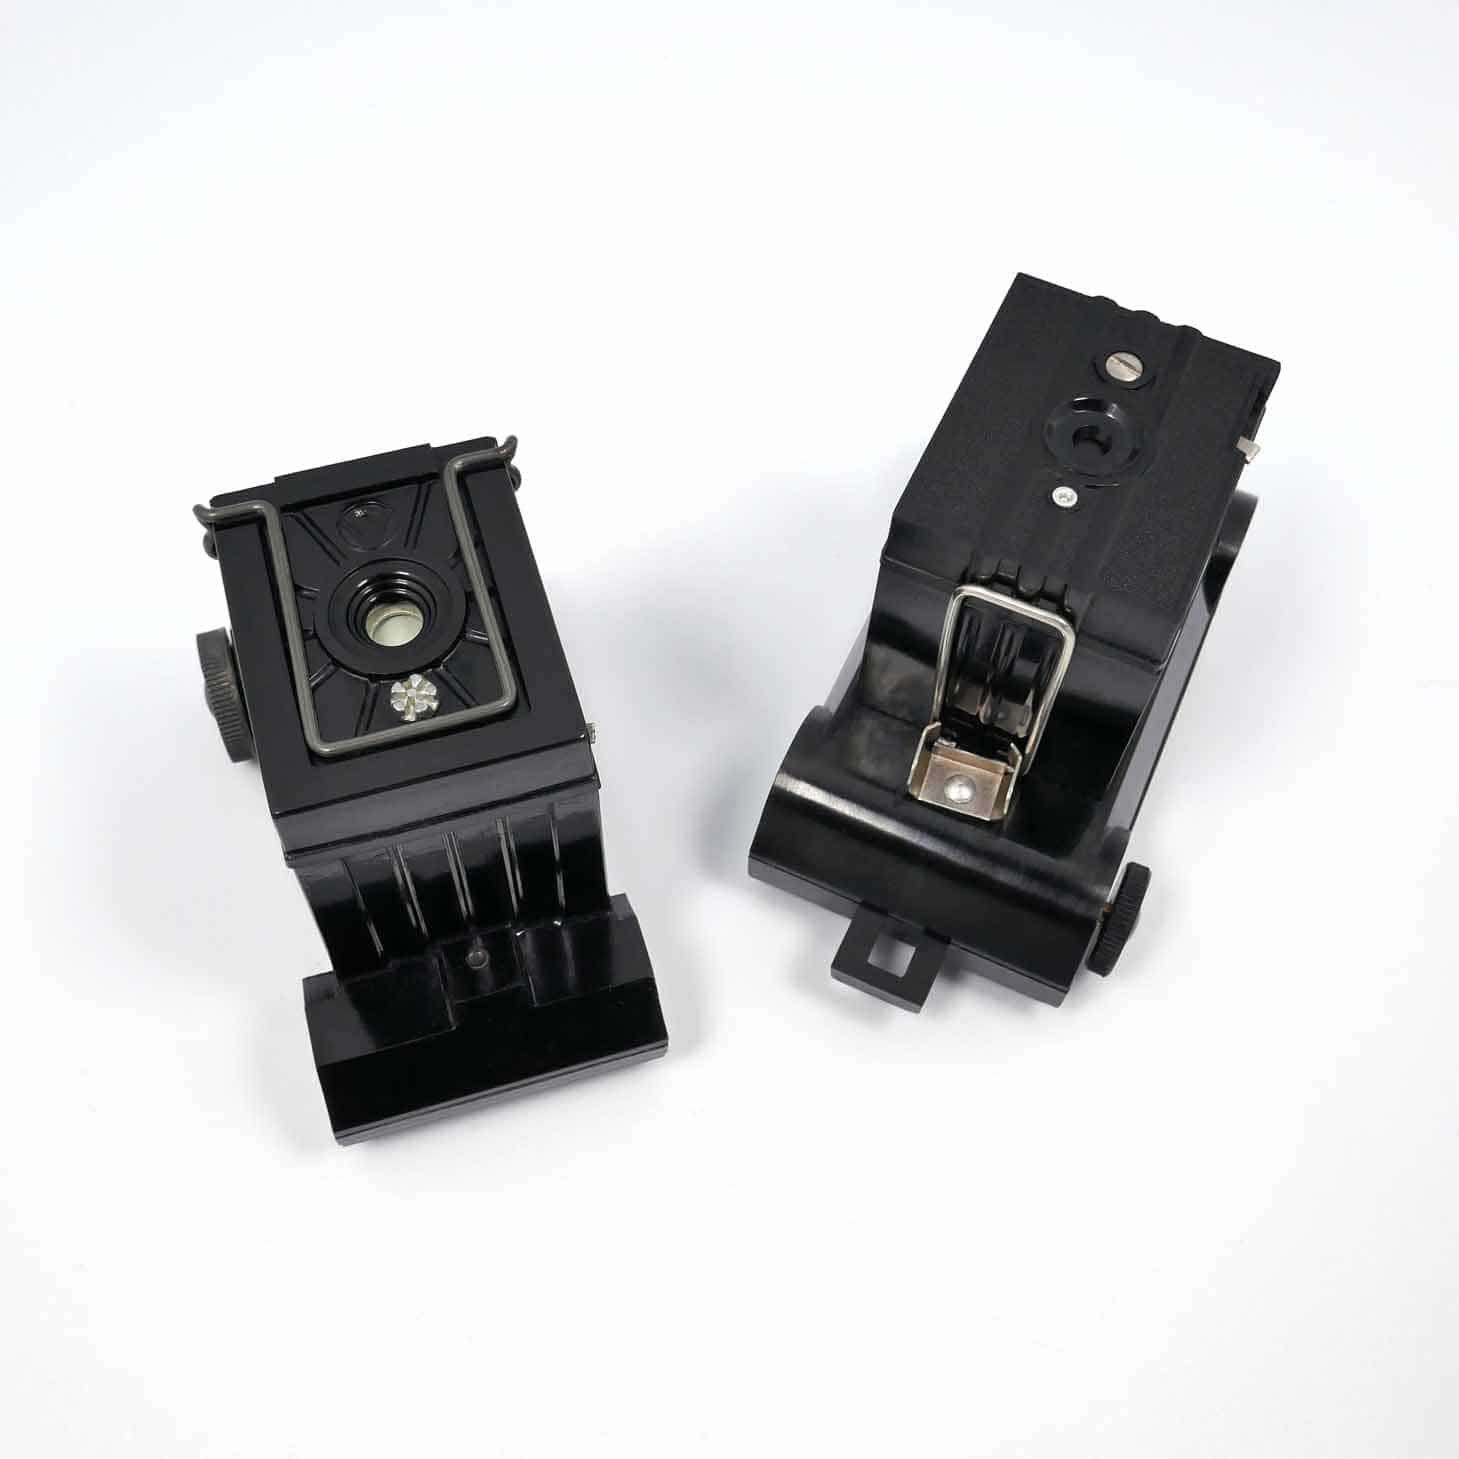 clean-cameras-Univex-A+Rower-02